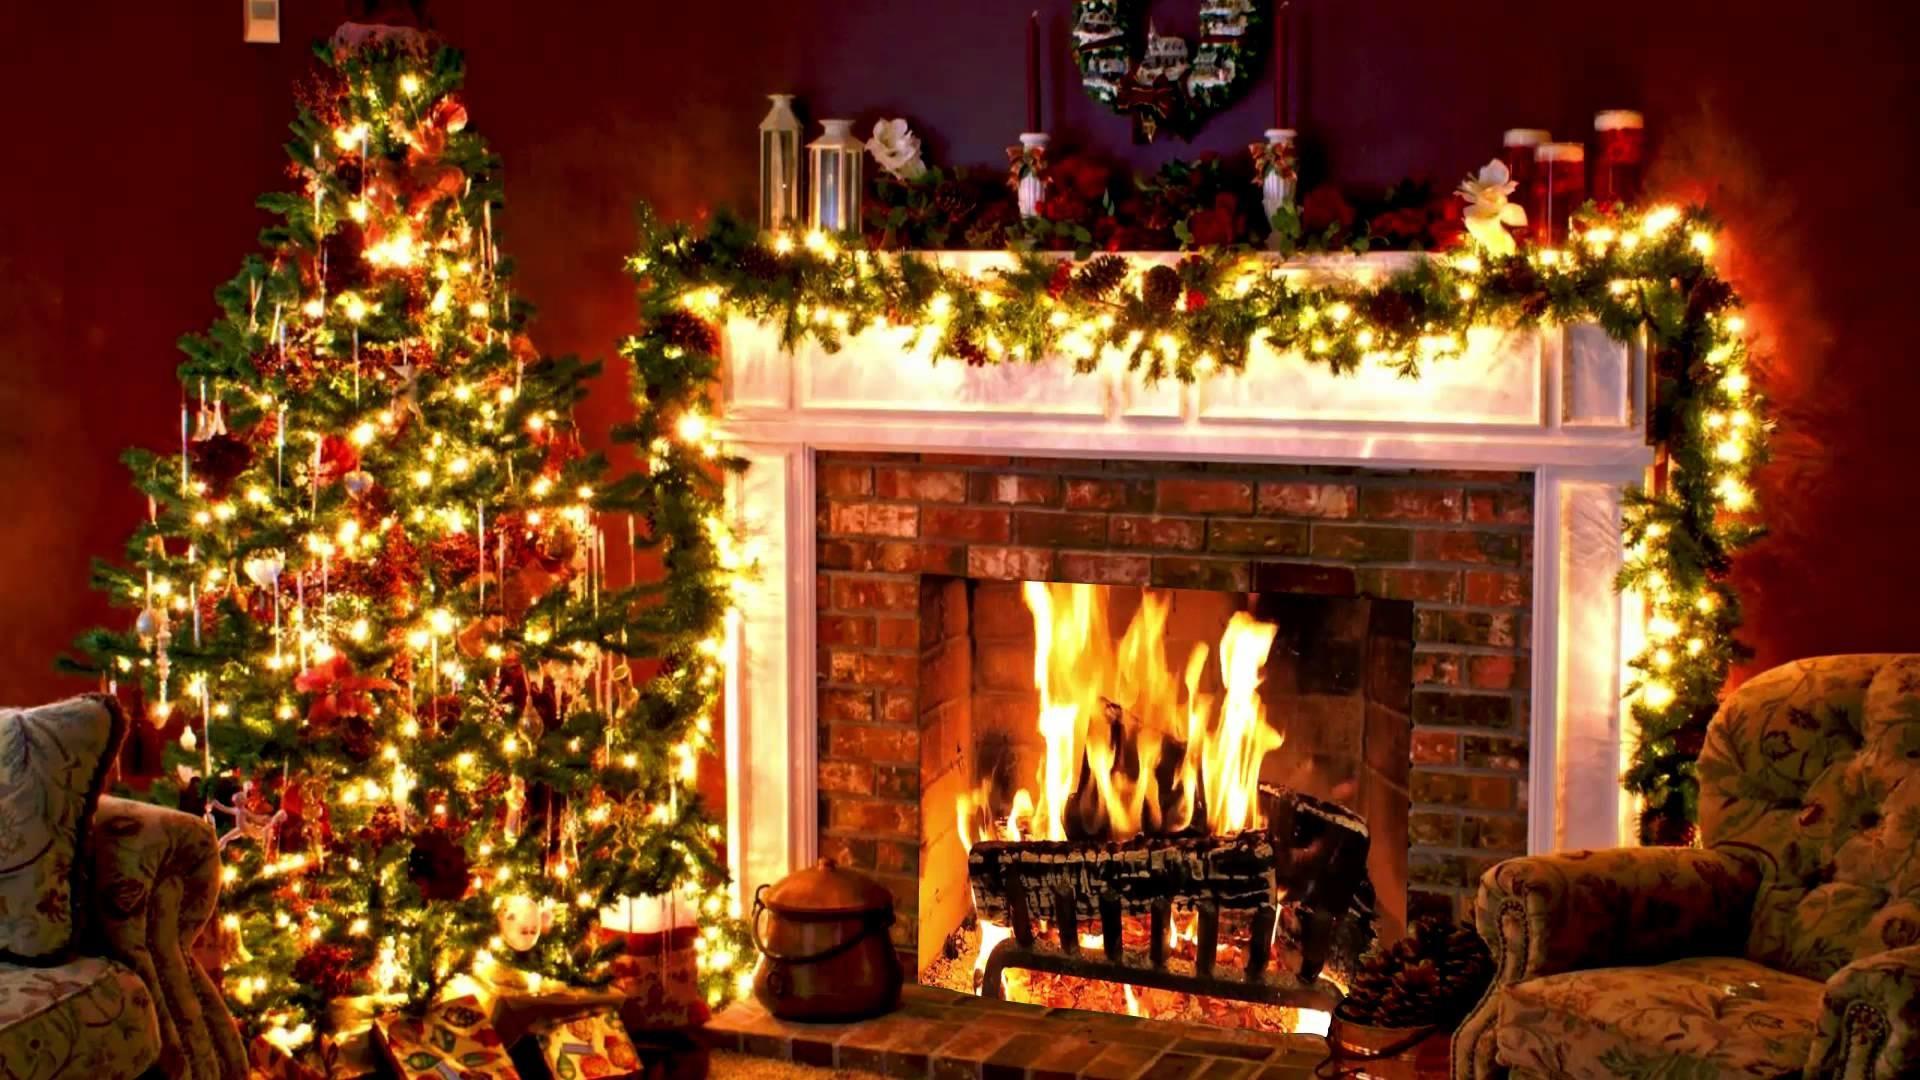 Res: 1920x1080, christmas-fireplace-wallpaper_202718.jpg .